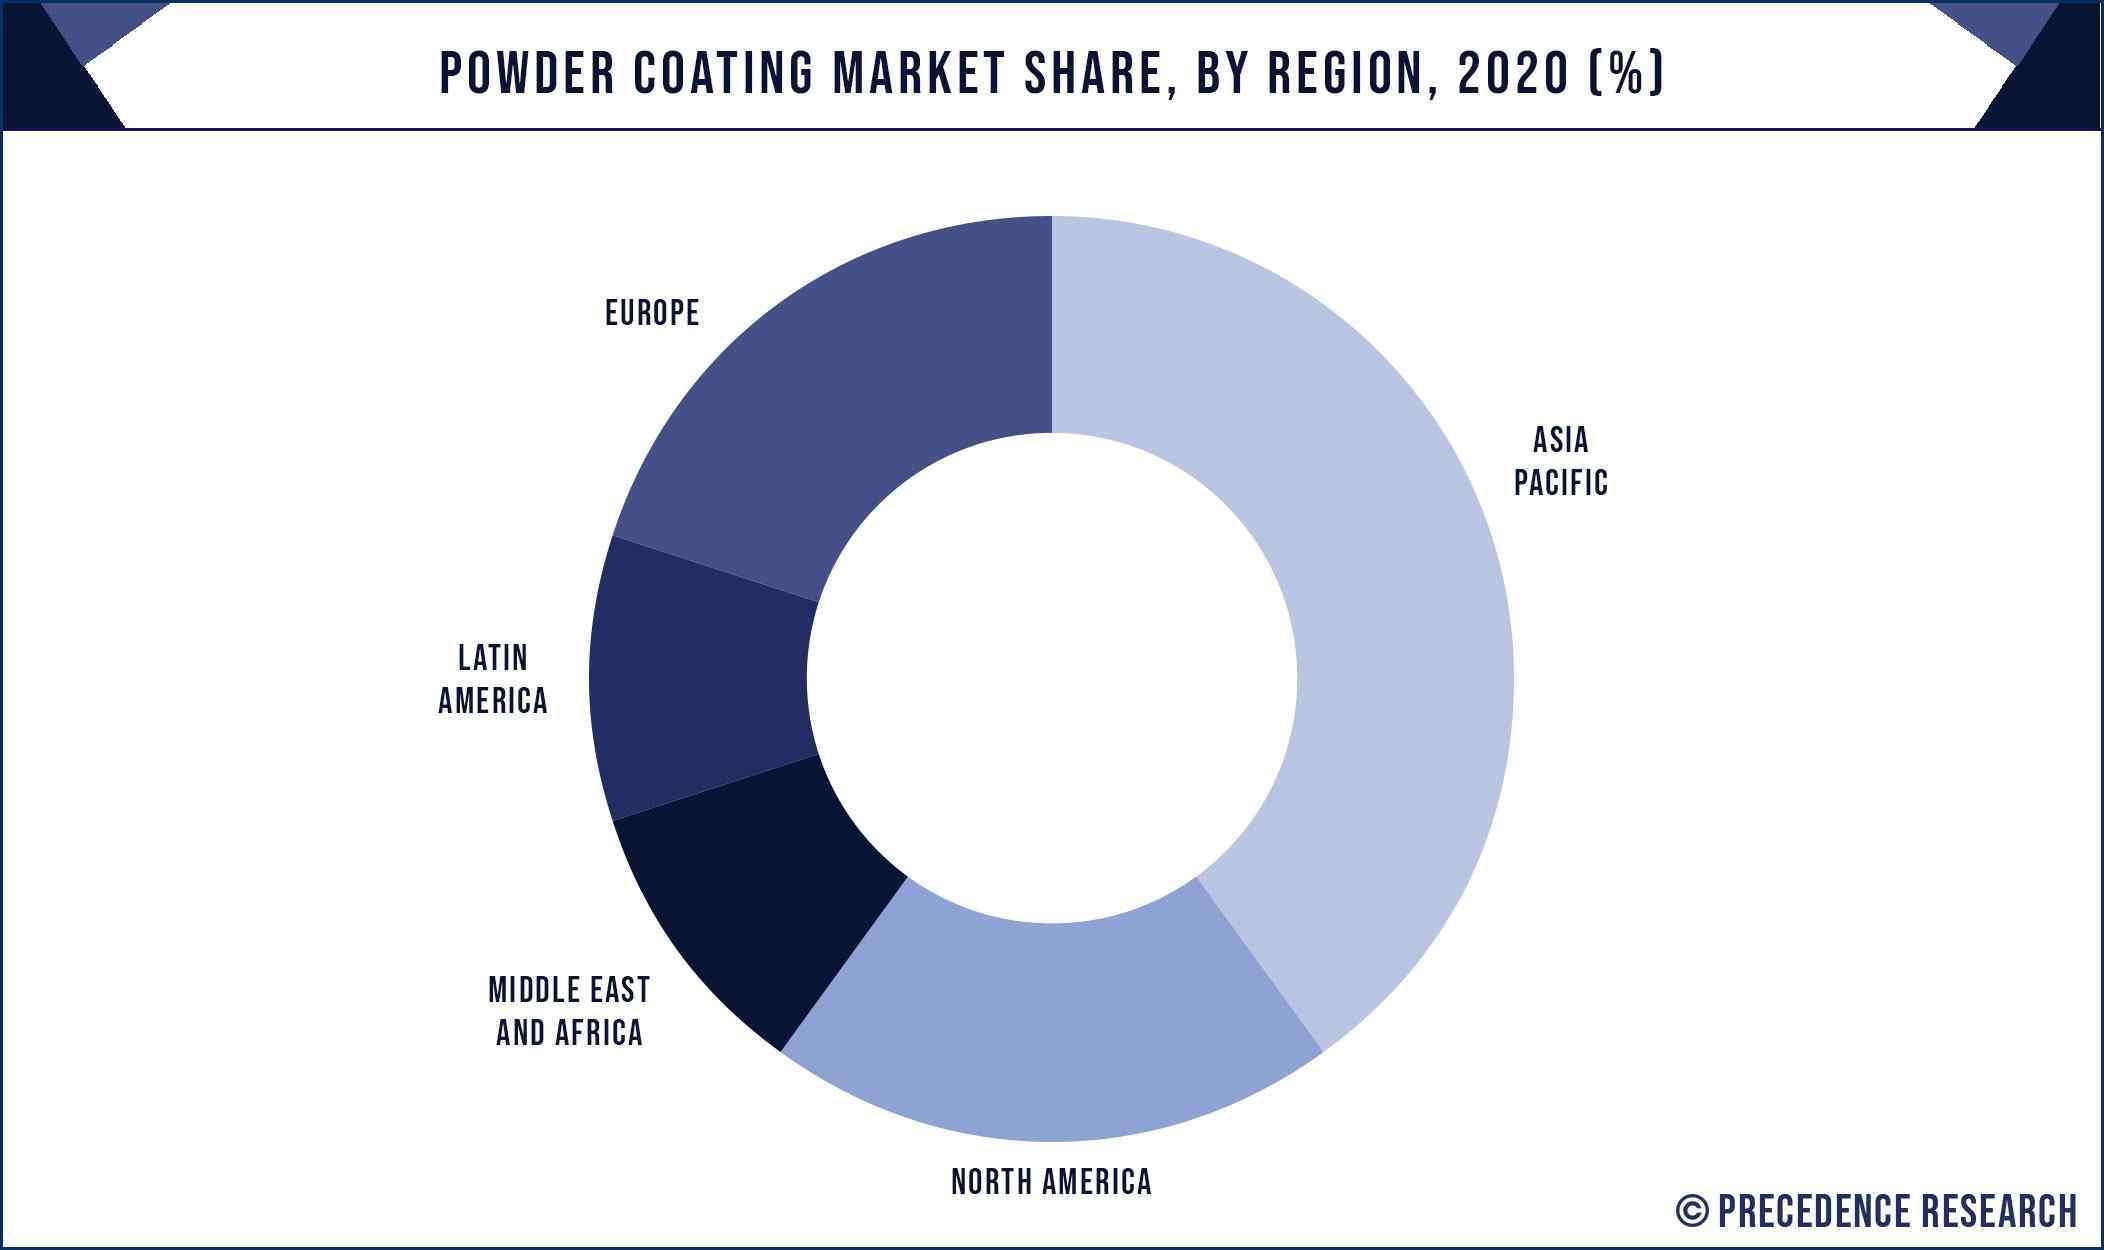 Powder Coating Market Share, By Region, 2020 (%)